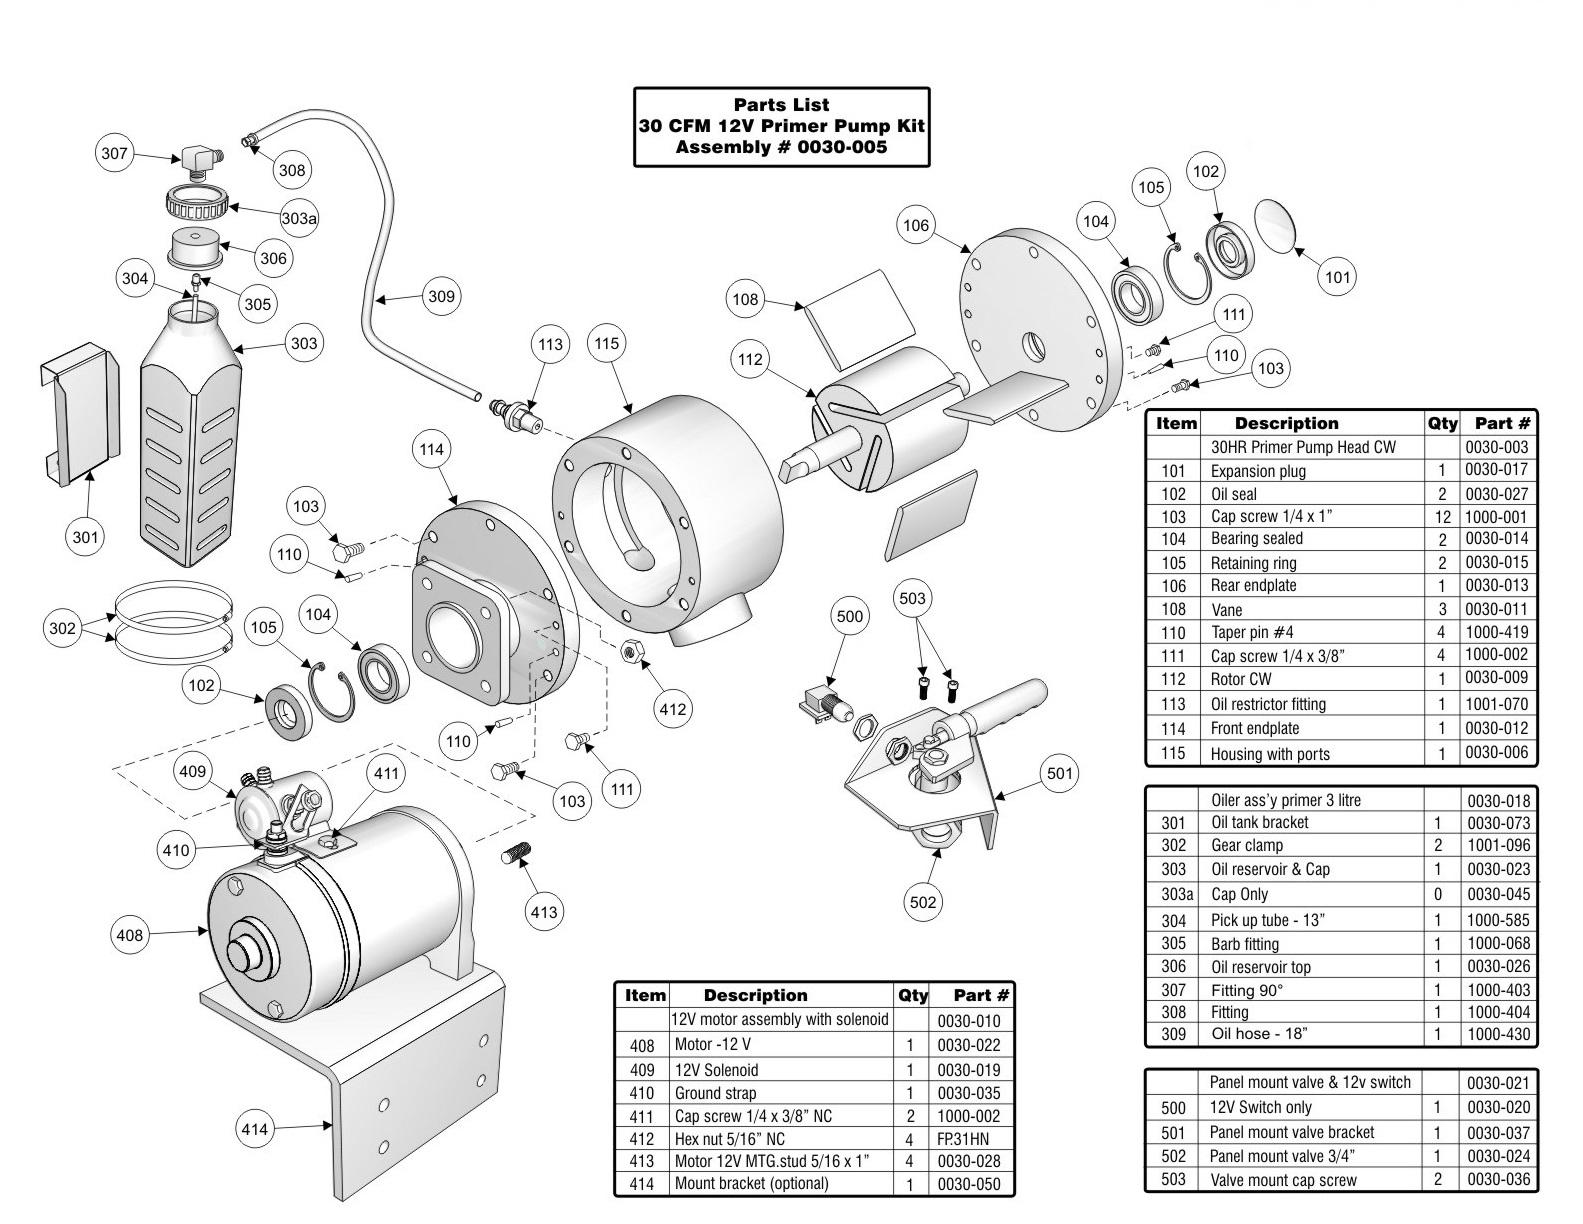 12 Volt Power Primer